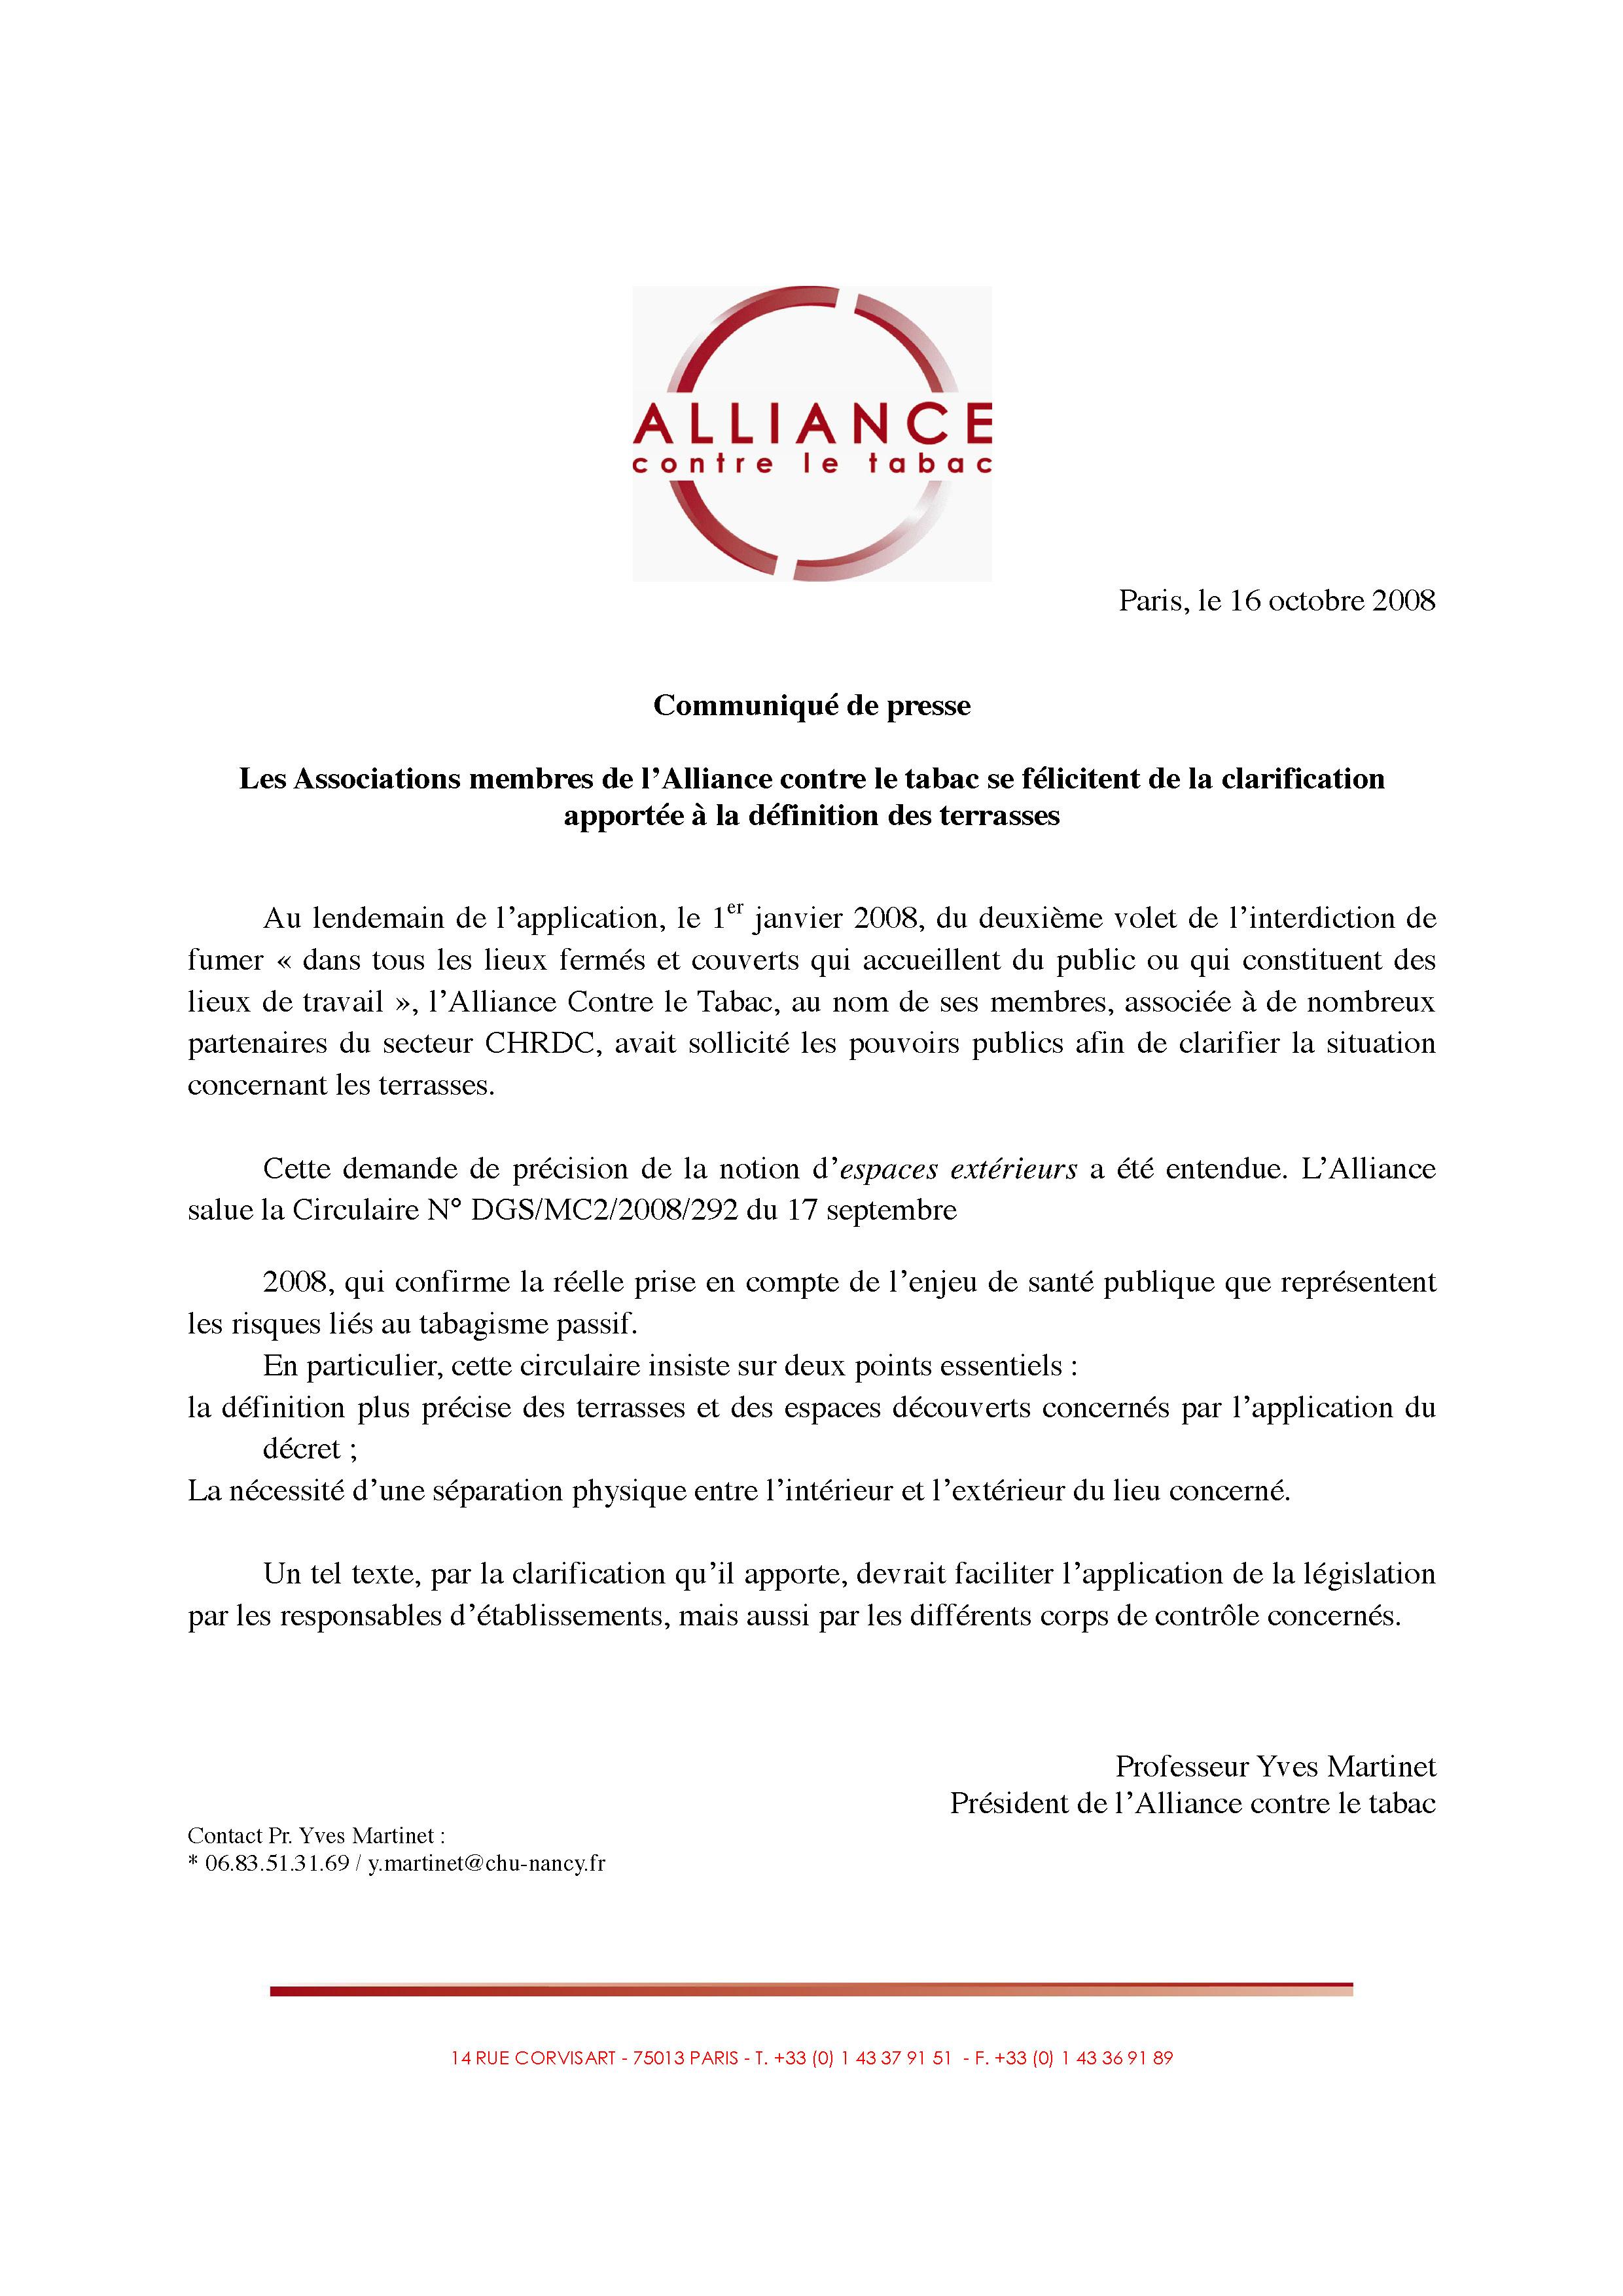 Alliance-CP_circulaireDGS-16oct2008.jpg